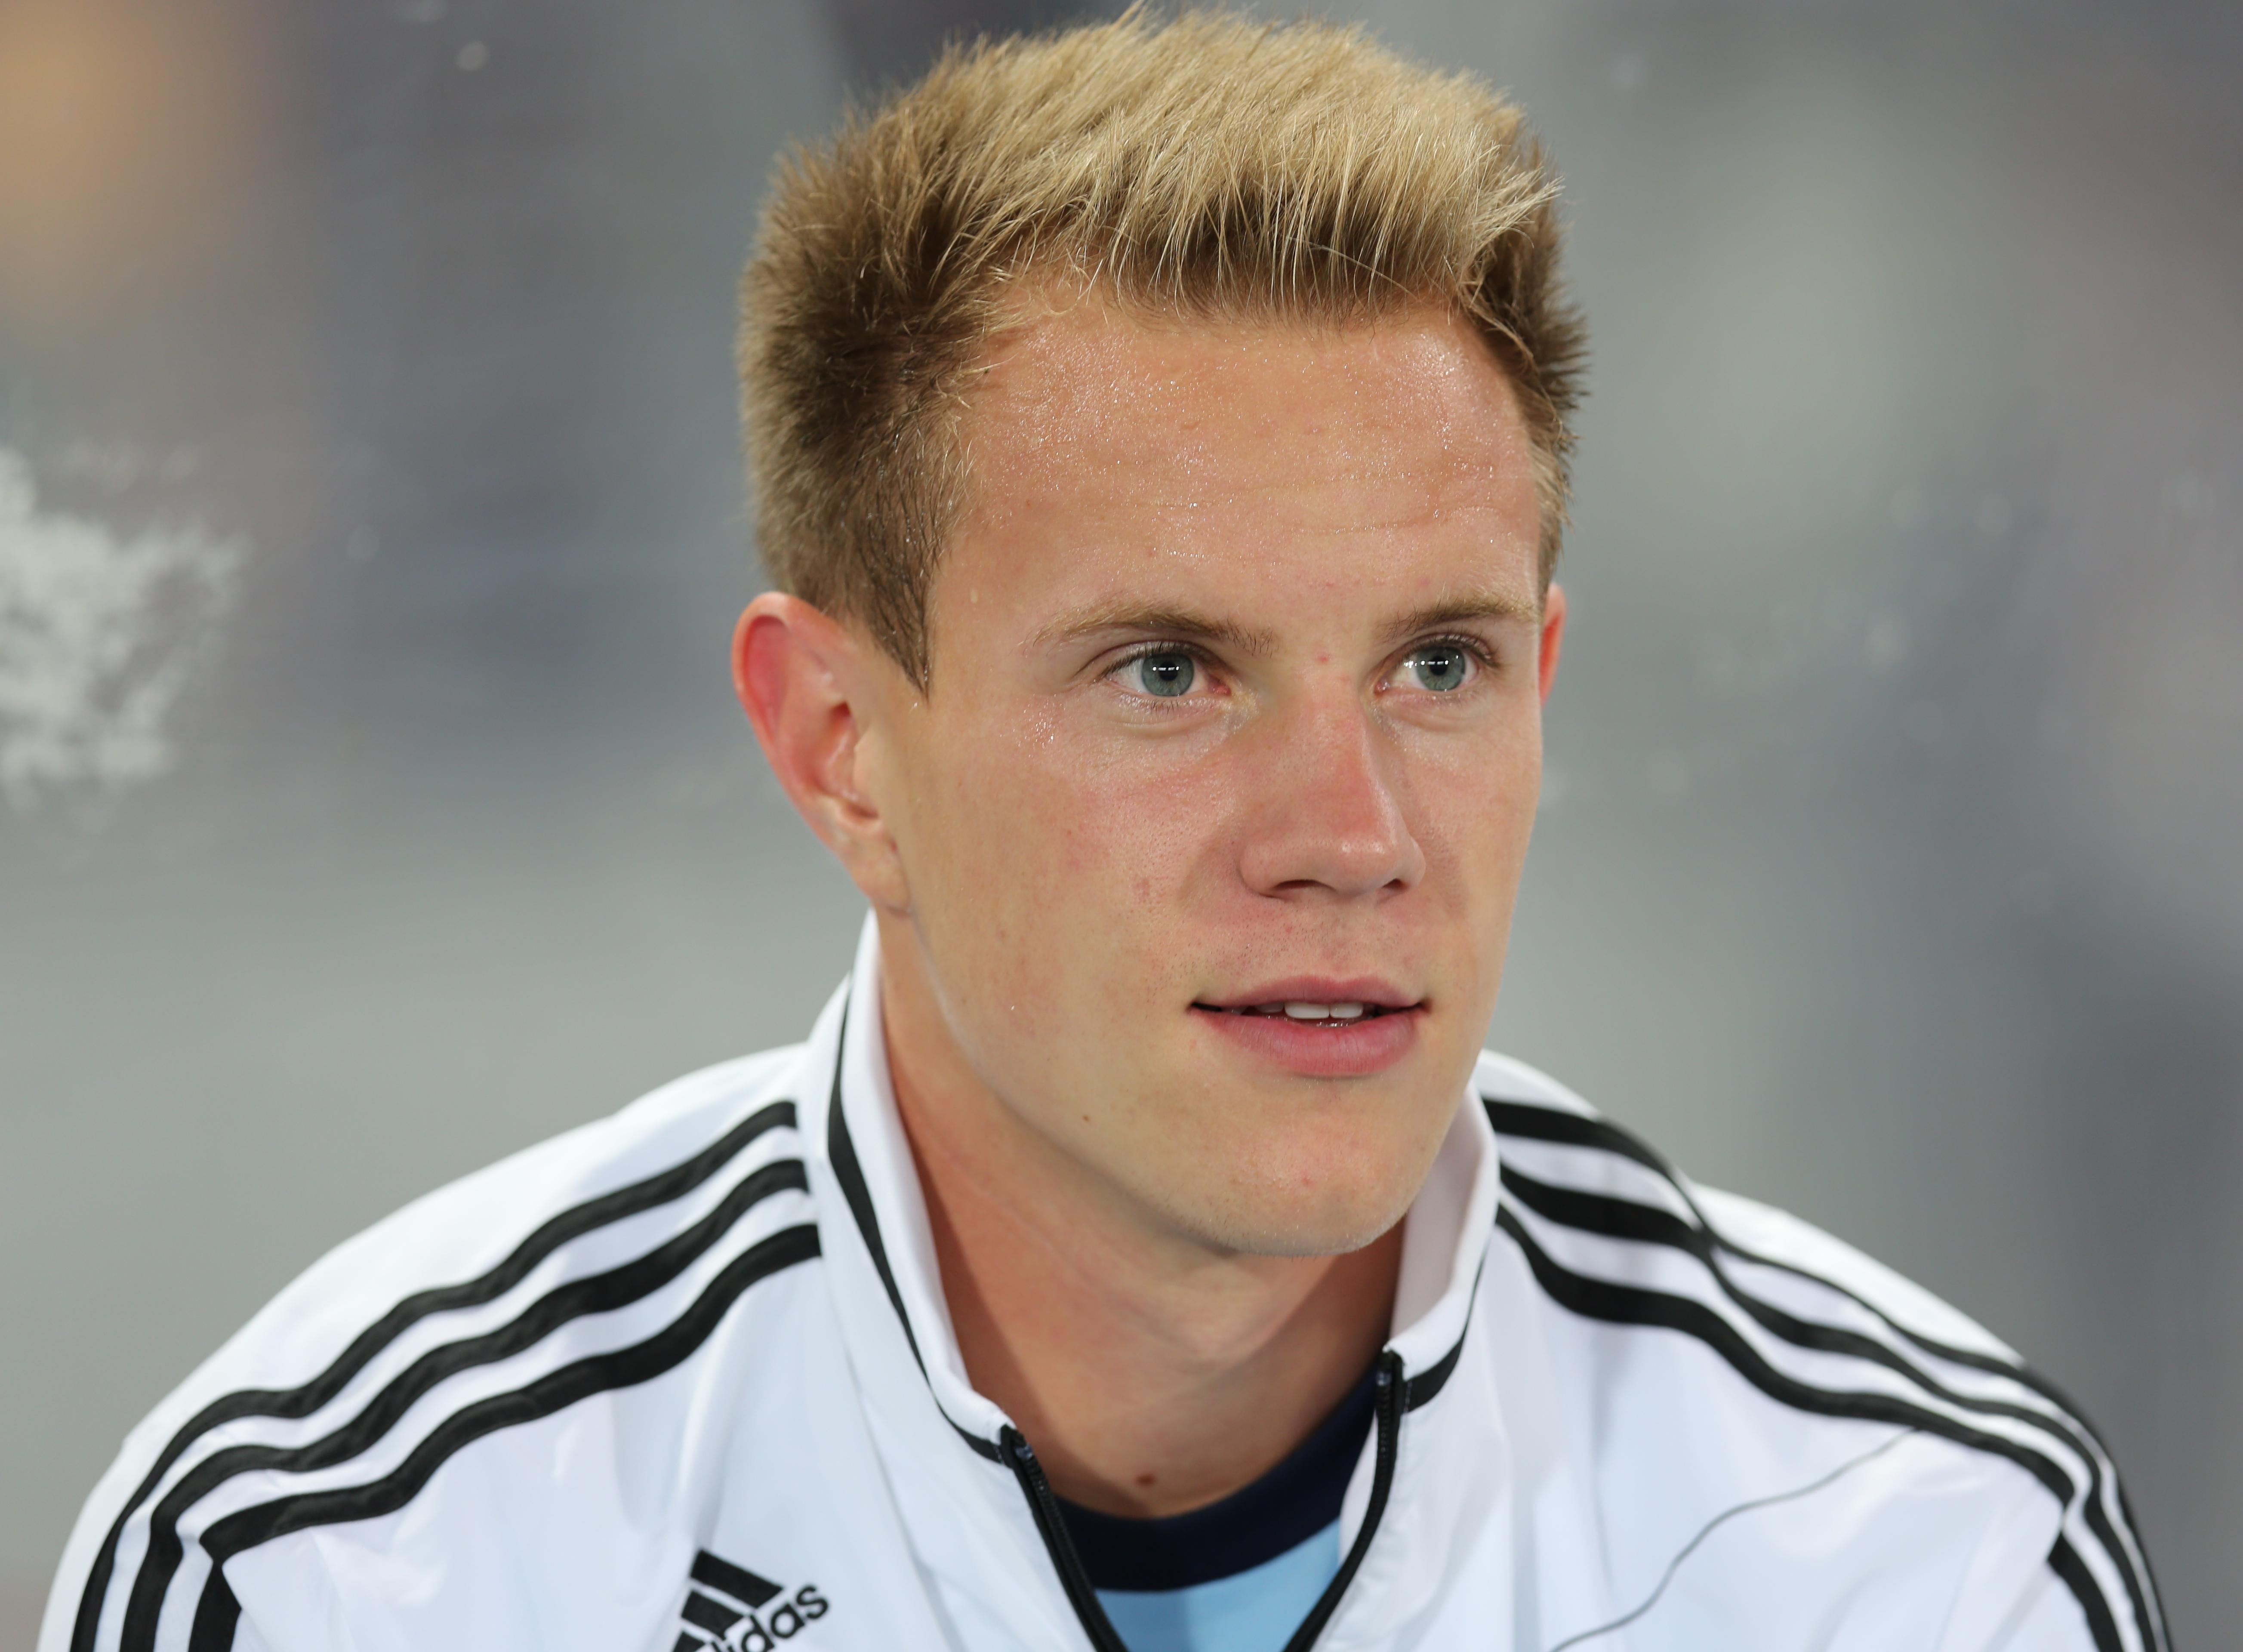 FIFA_WC-qualification_2014_-_Austria_vs._Germany_2012-09-11_-_Marc-André_ter_Stegen_01